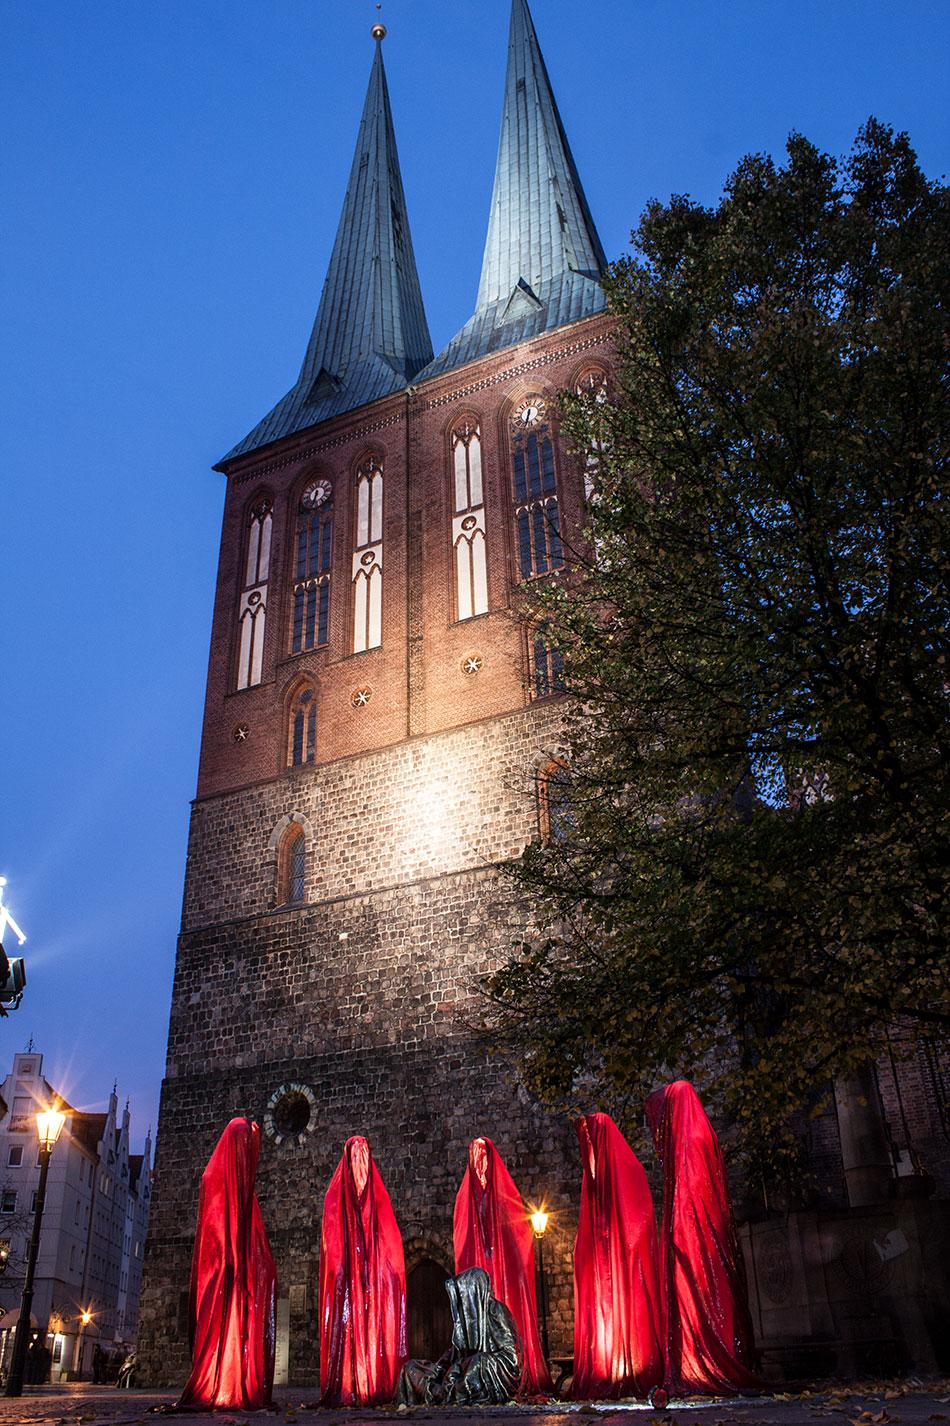 festival-of-lights-berlin-light-art-festival-contemporary-fine-art-design-show-guardiansof-time-manfred-kili-kielnhofer-sculpture-3701